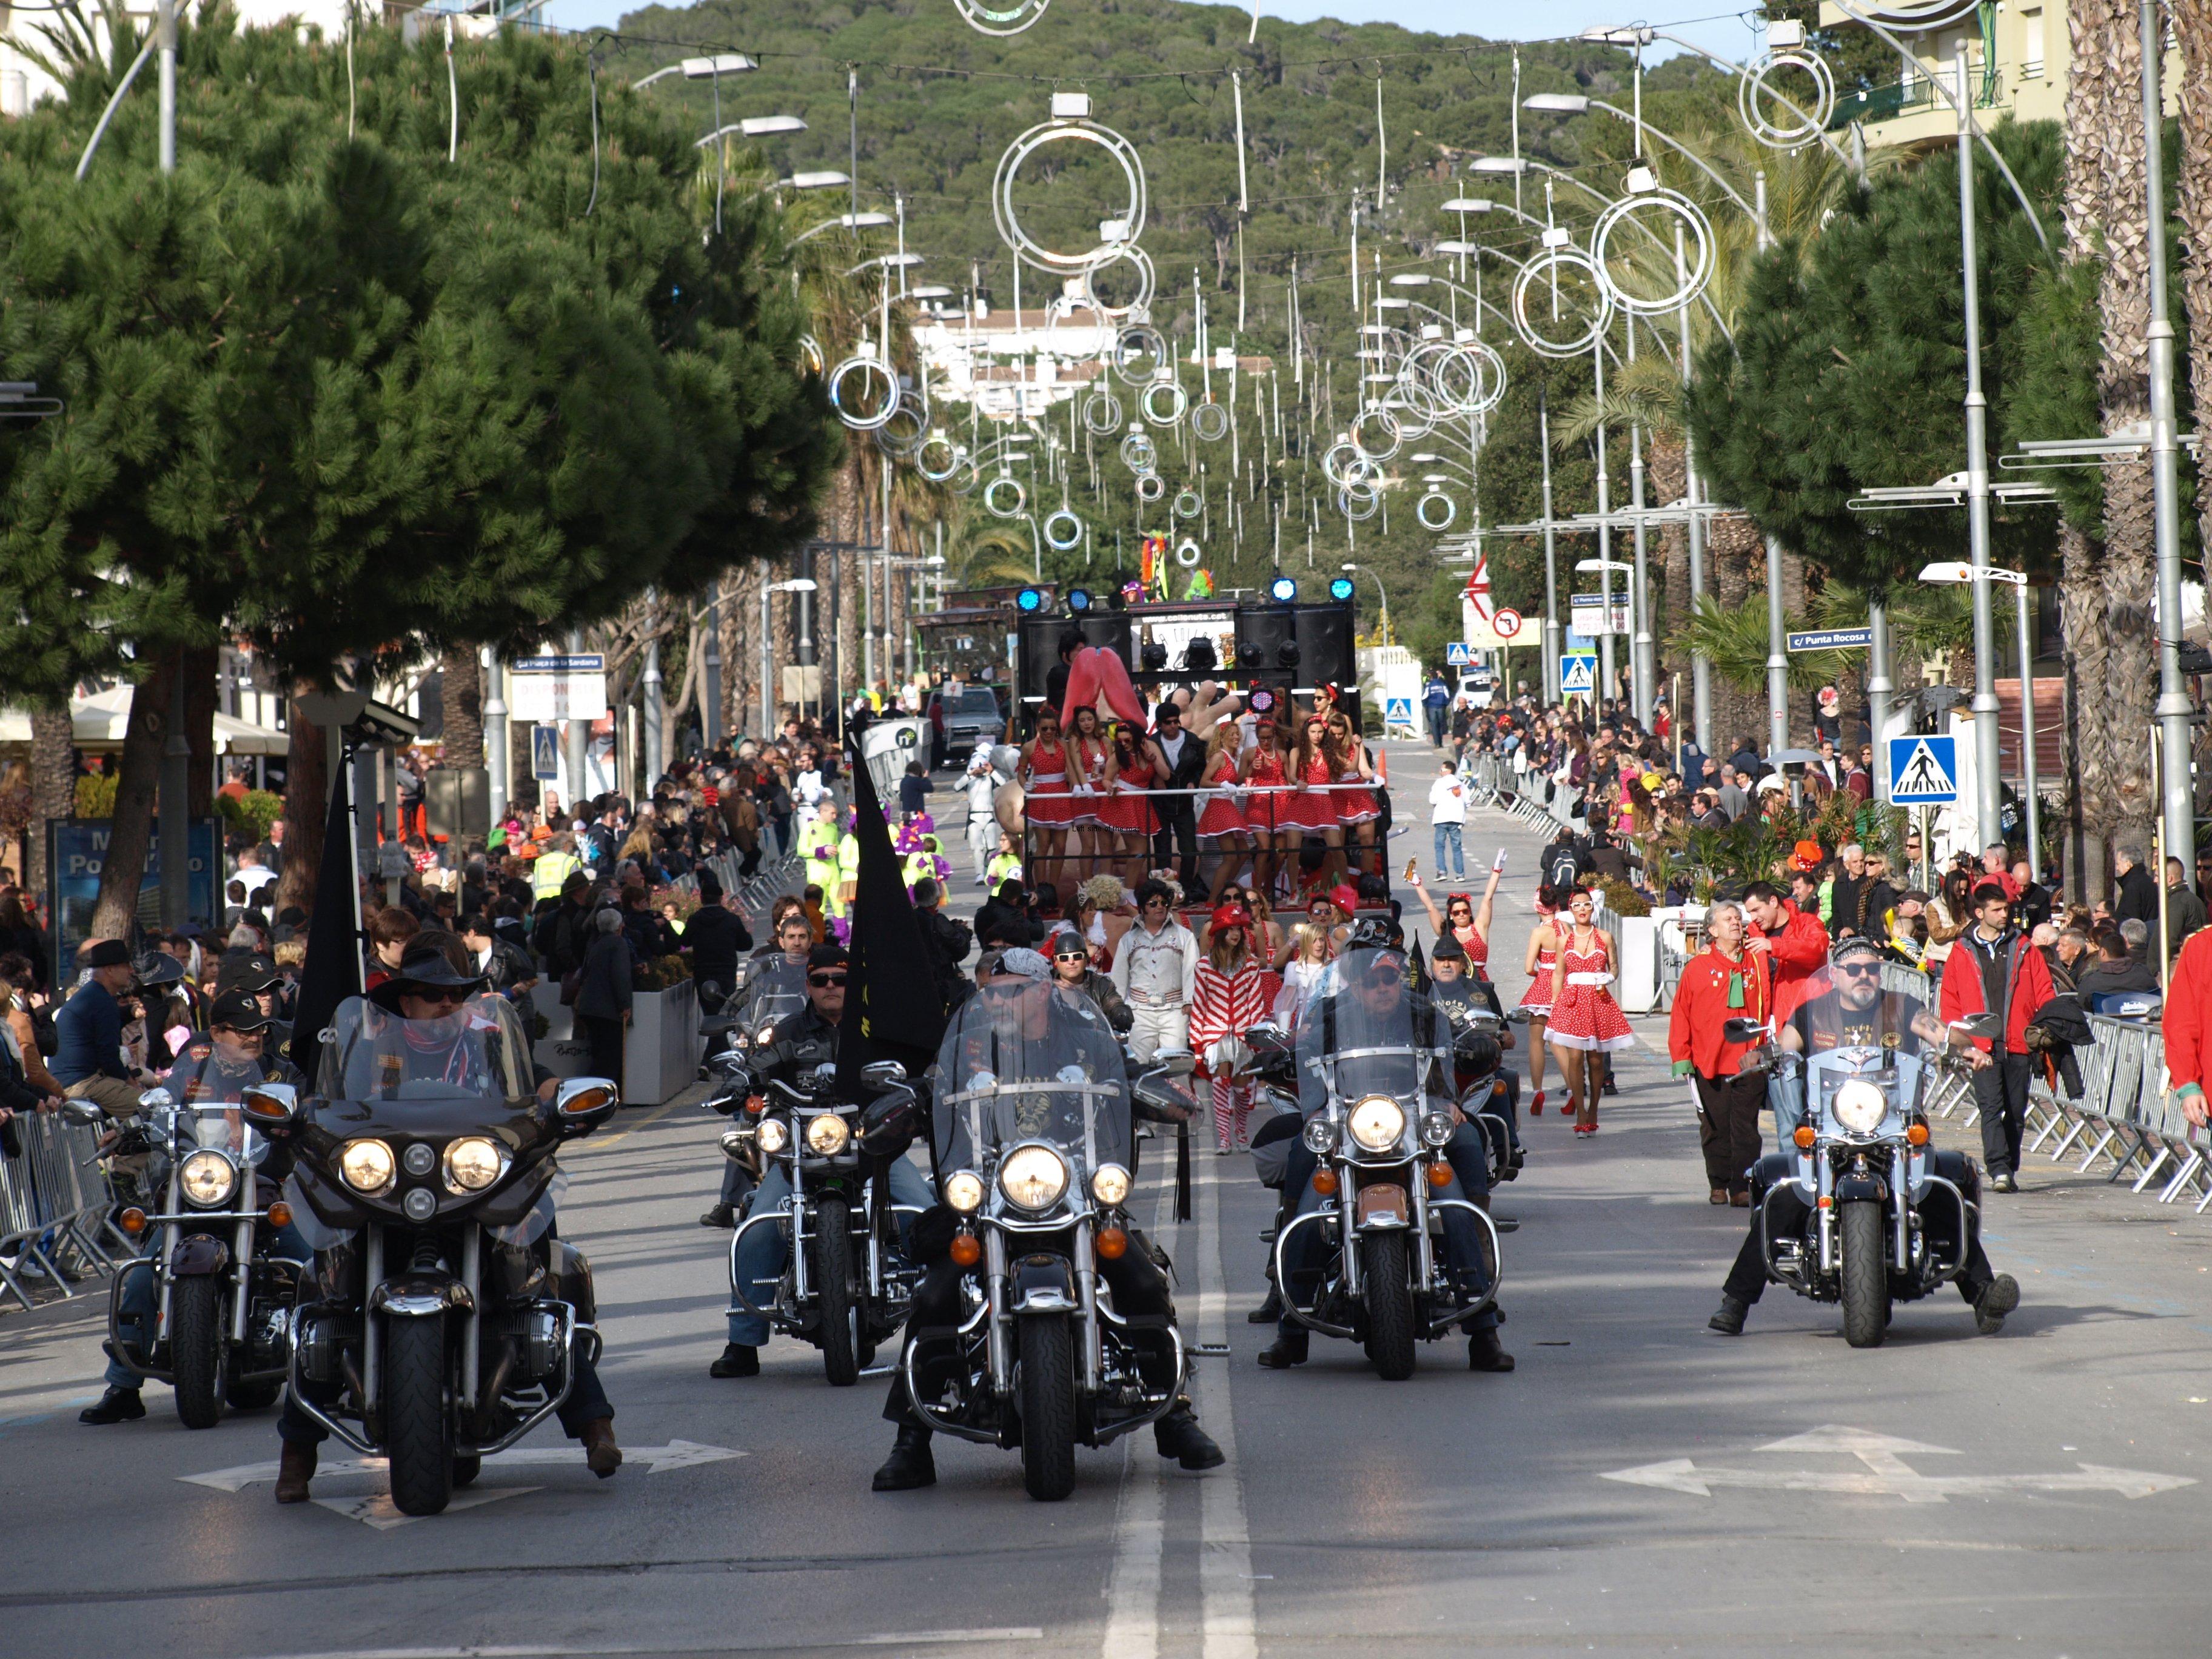 Platja d'Aro Carnival 2014